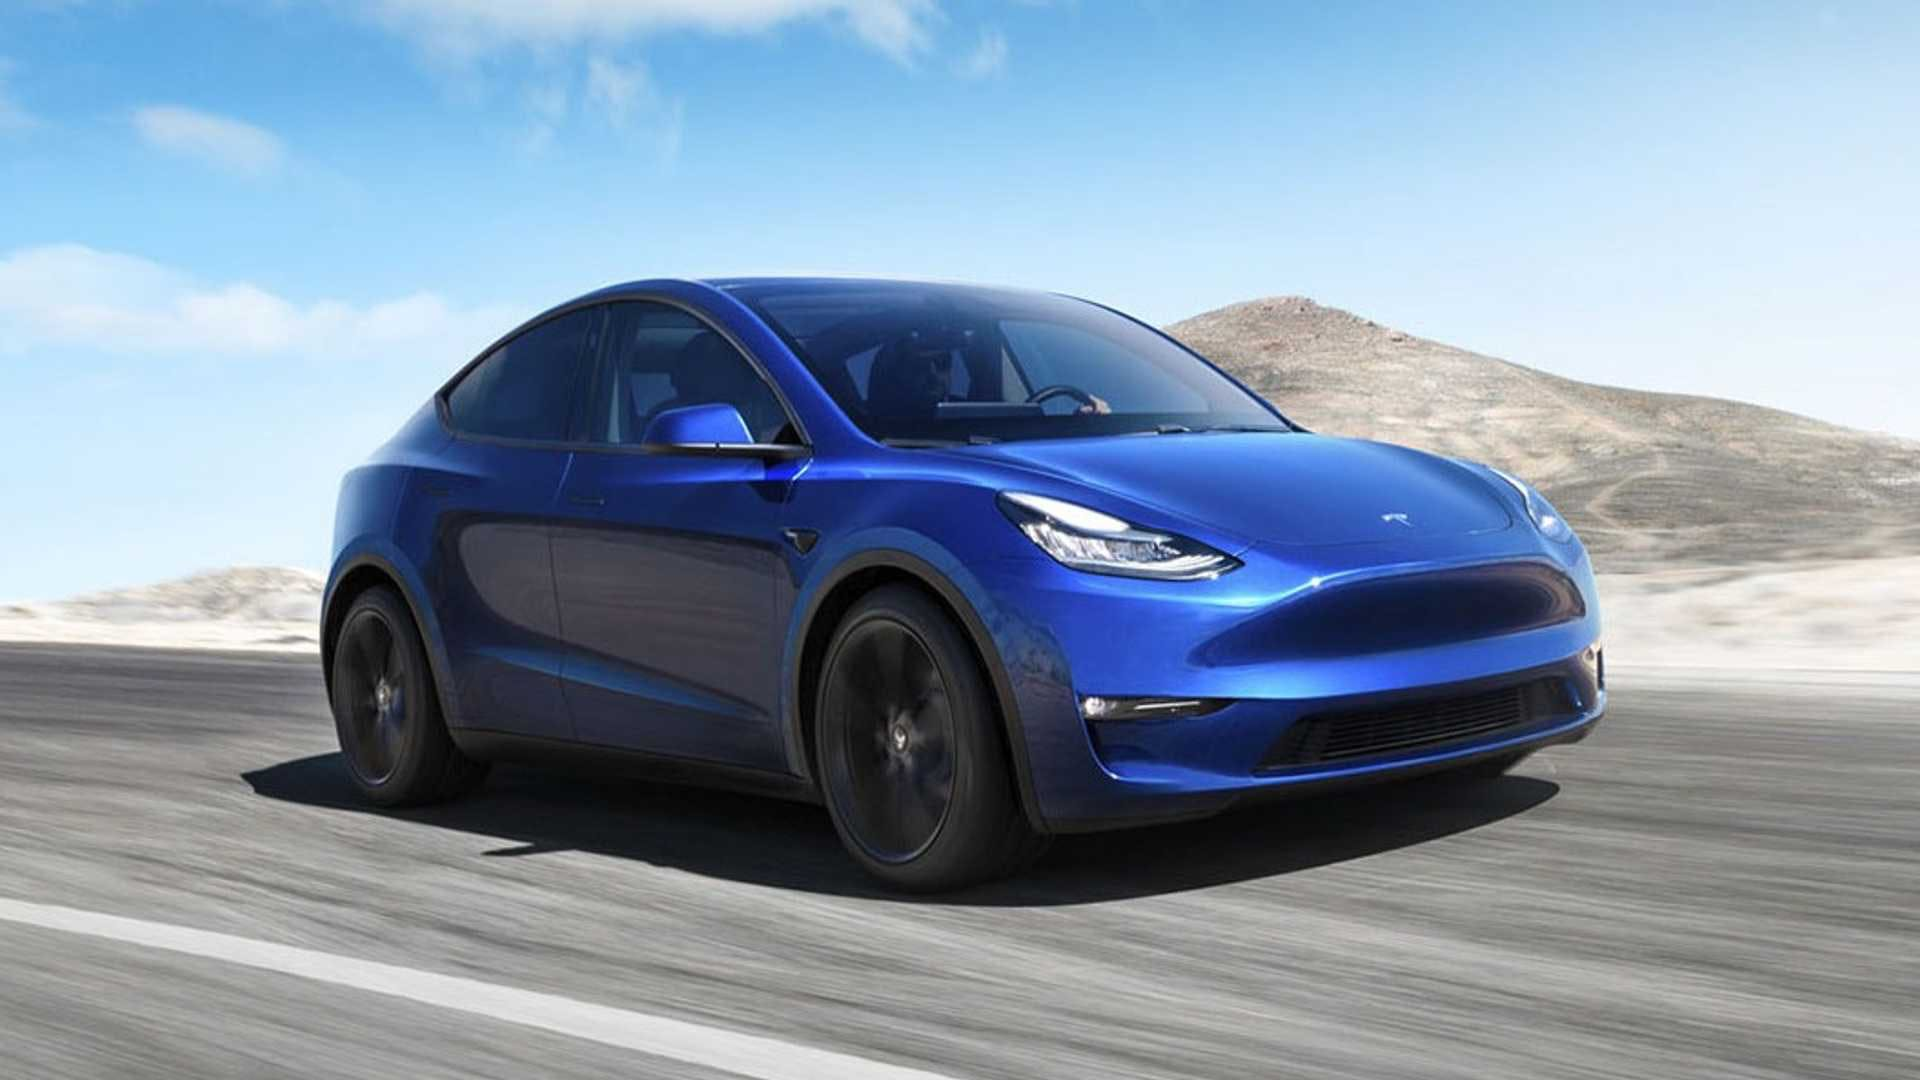 Tesla Model Y auto blu vista tre quarti dinamica su strada sfondo paesaggio